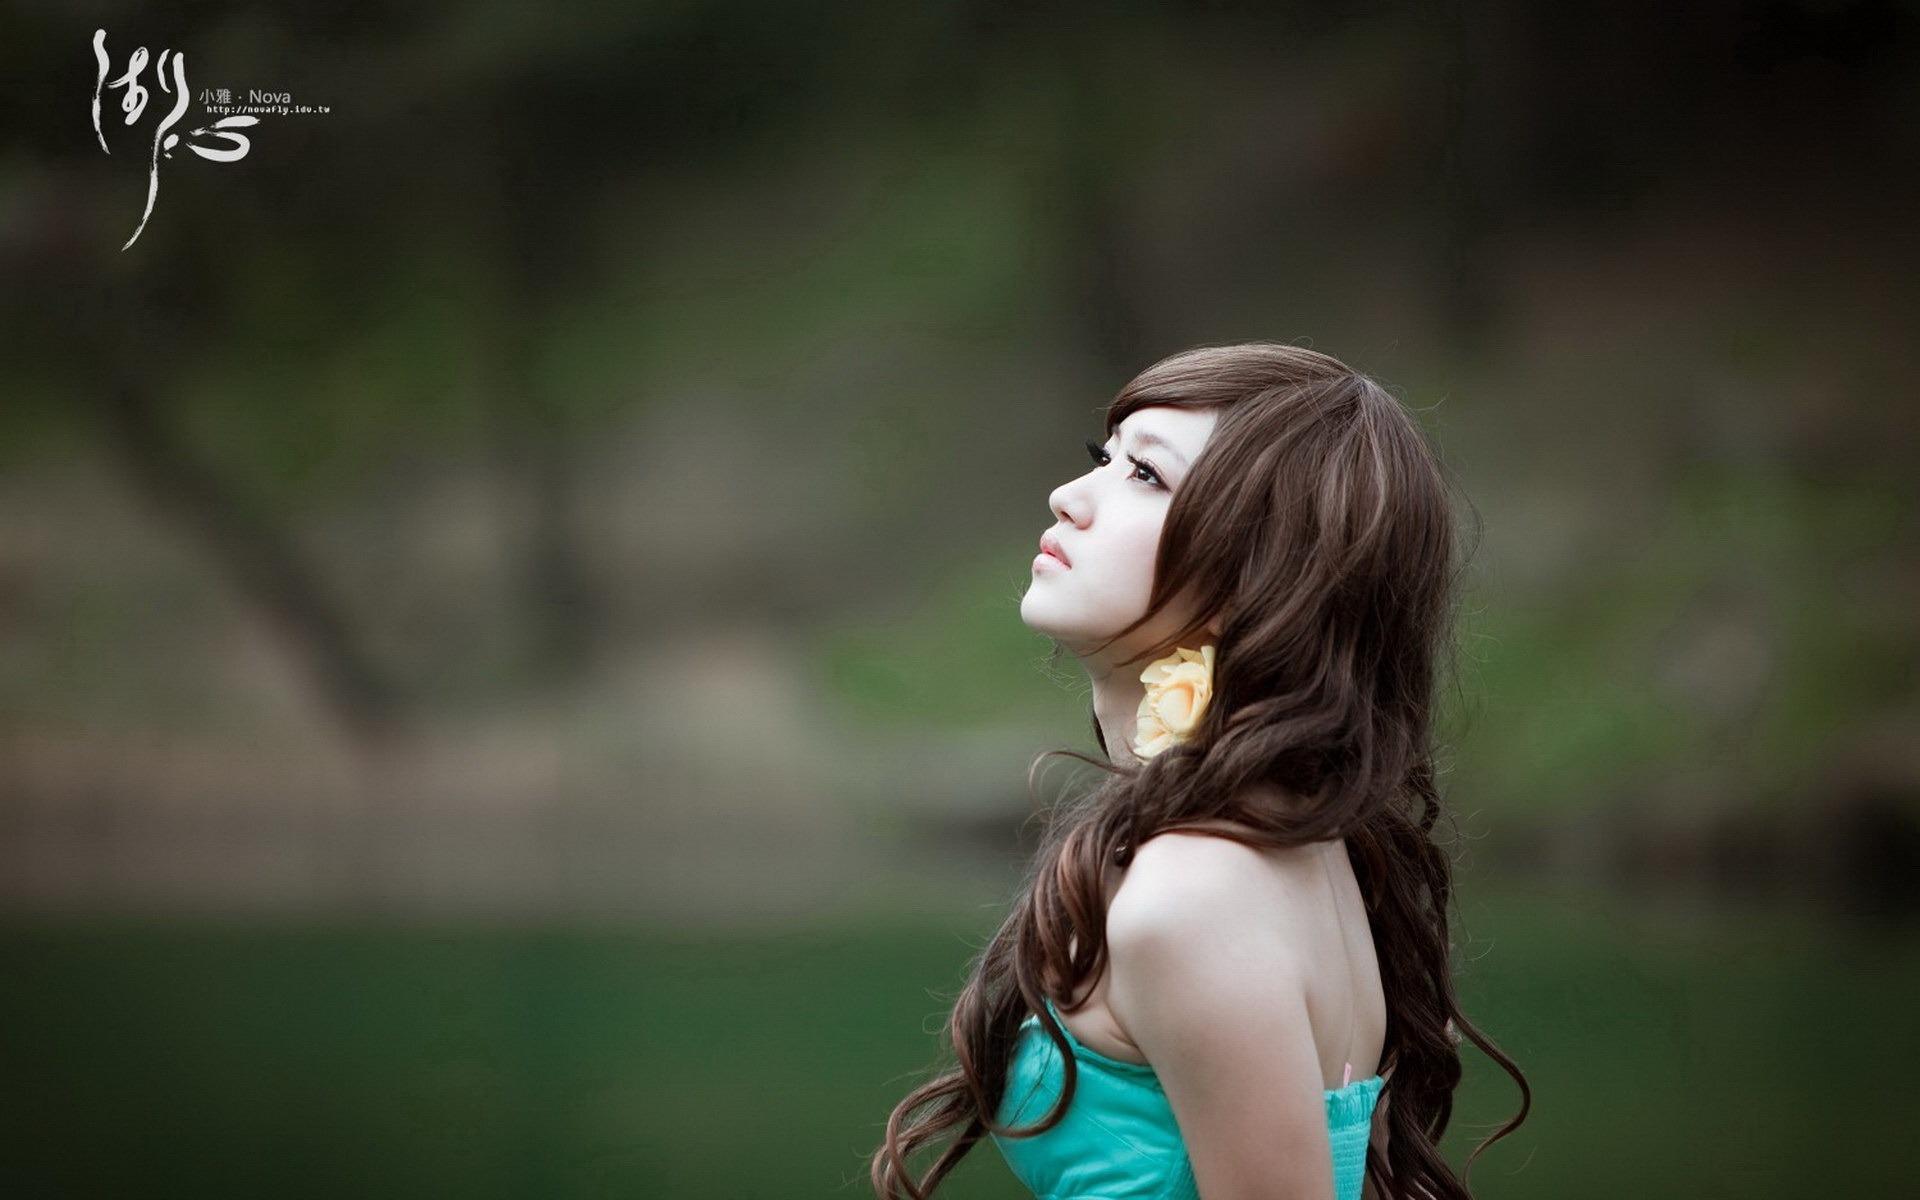 Xiao Ya wallpapers HD quality